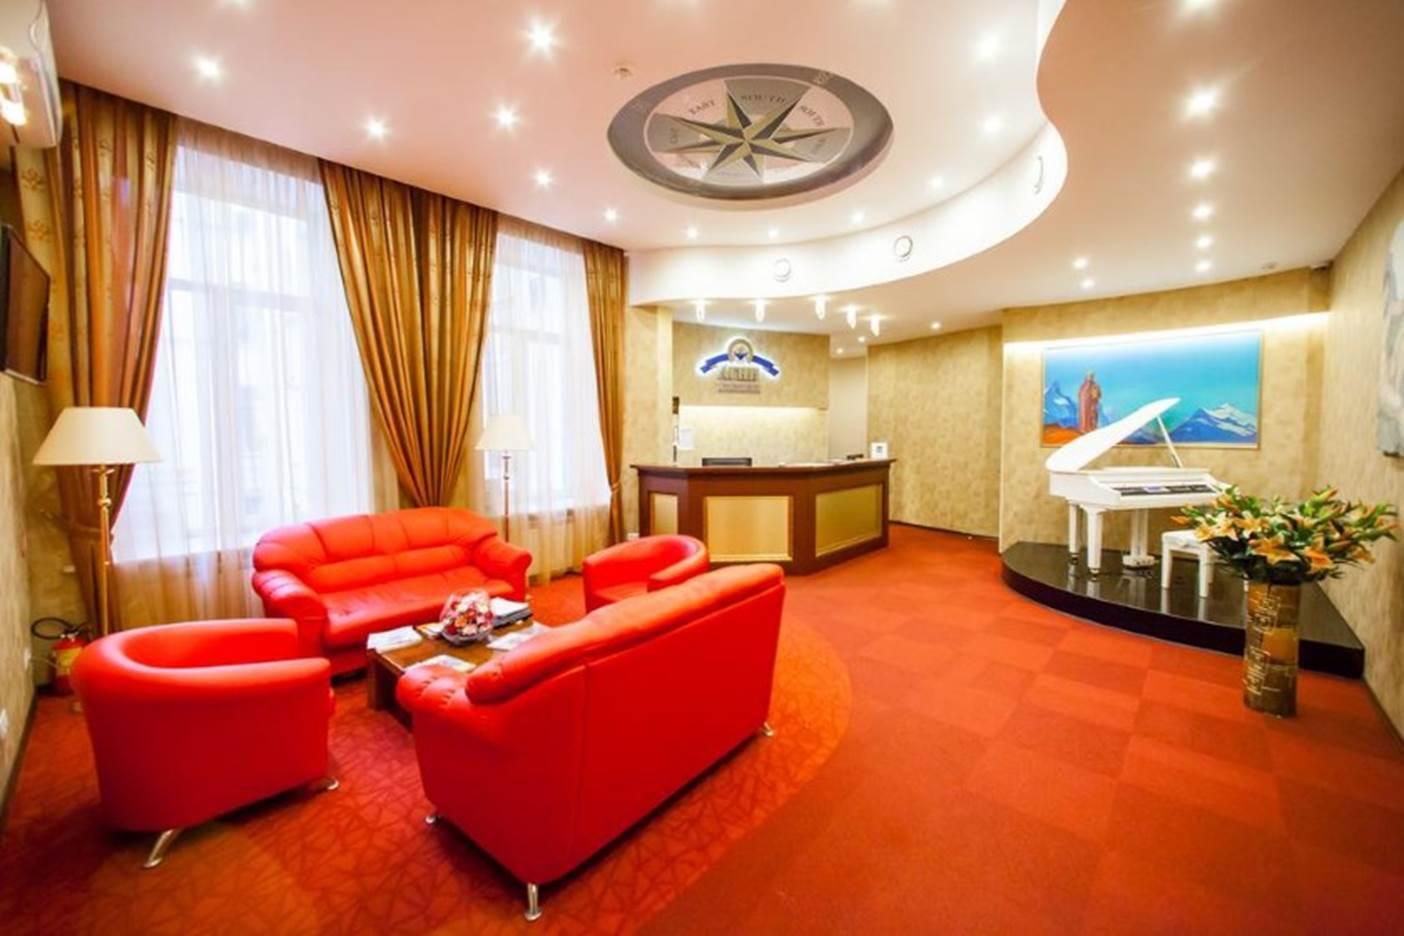 هتل ایندیگو سن پترزبورگ